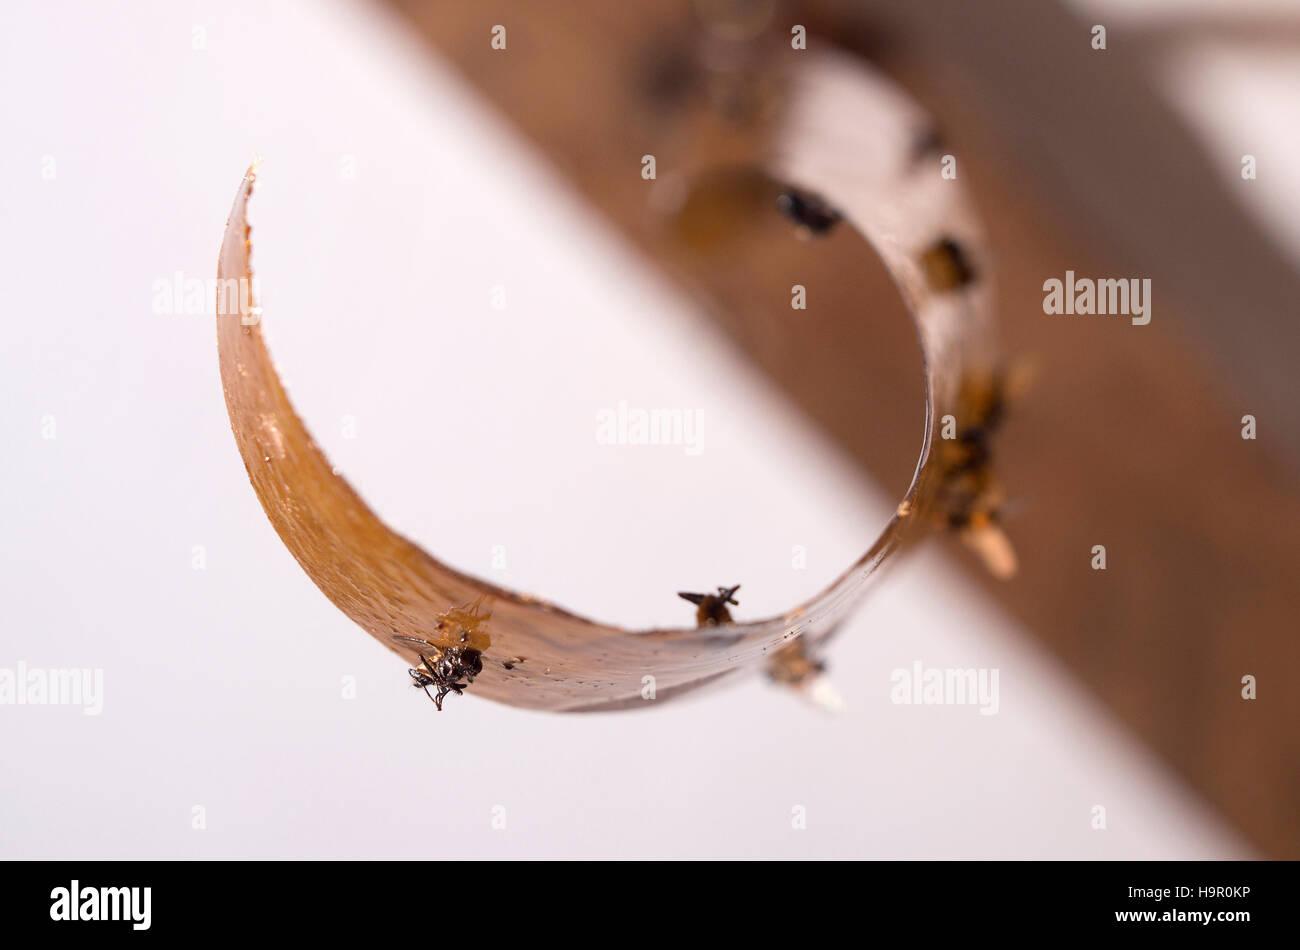 Dead Flies Stuck Sticky Fly Stockfotos & Dead Flies Stuck Sticky Fly ...